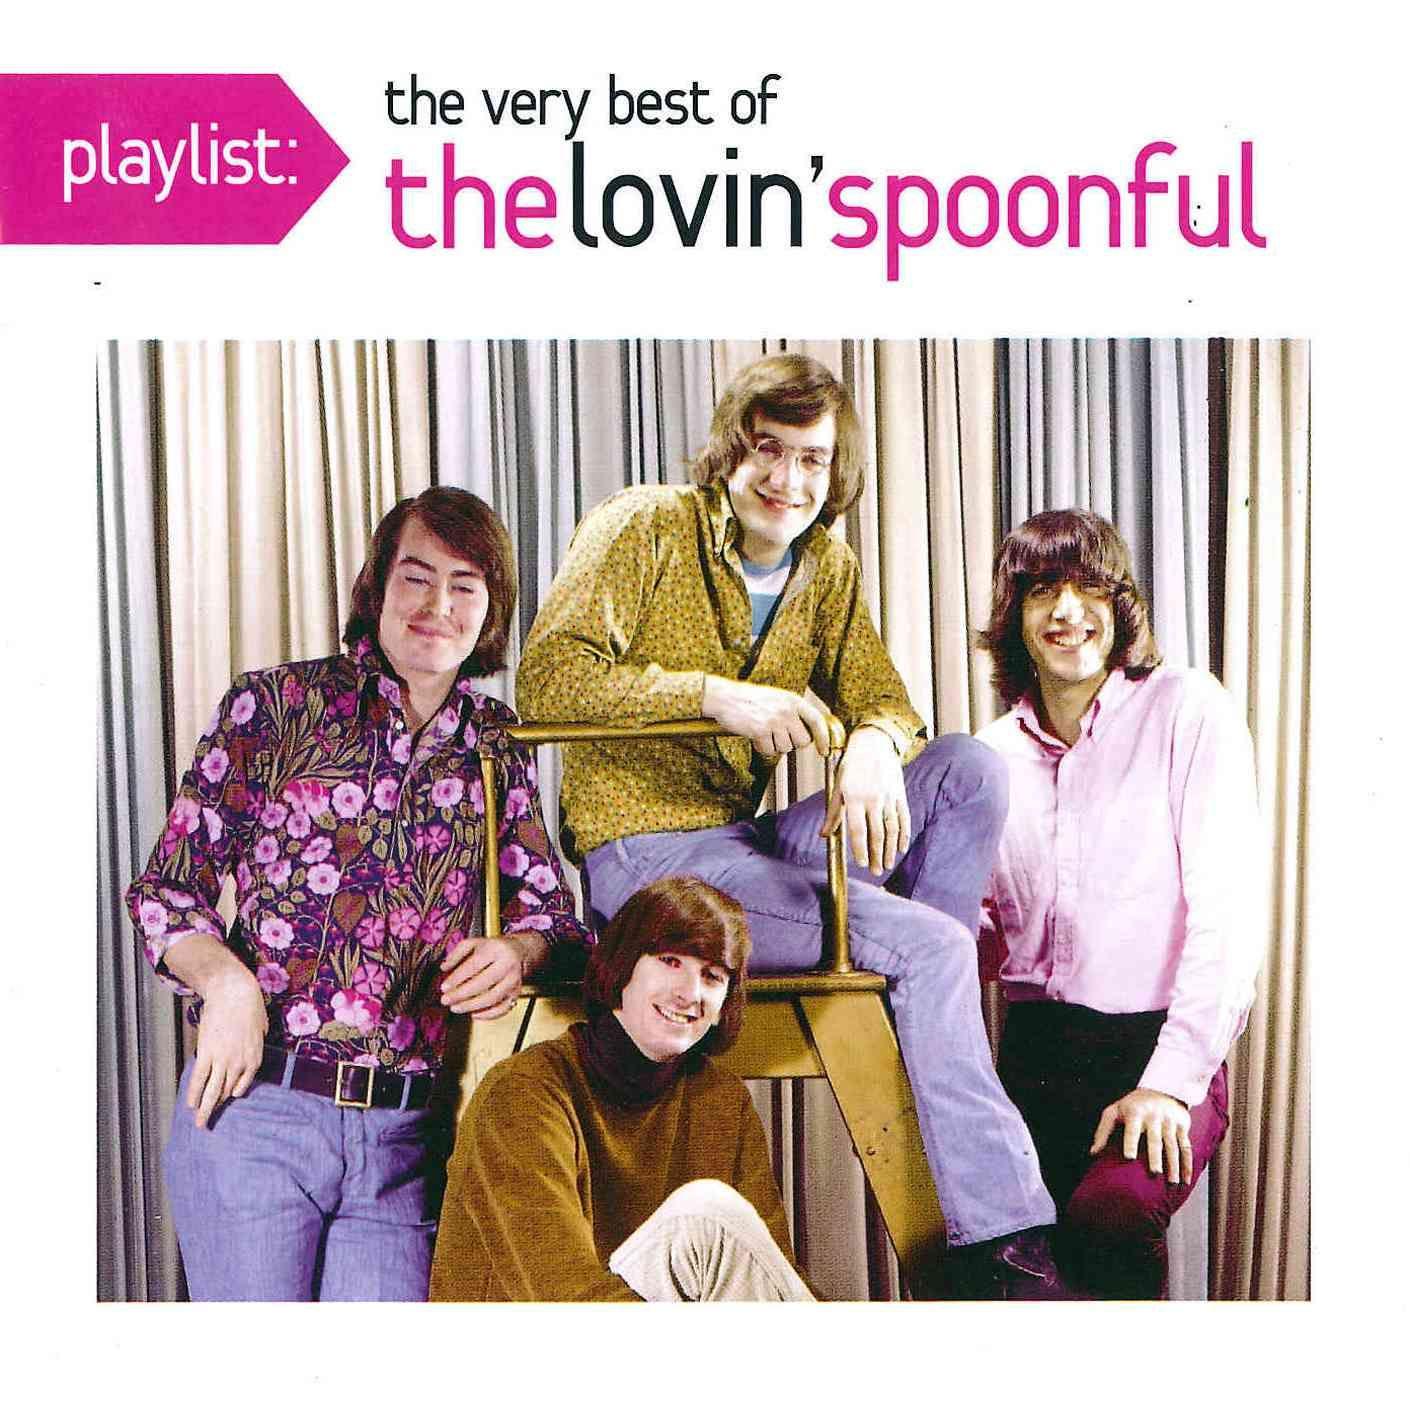 Lovin' Spoonful - Playlist: The Very Best of The Lovin' Spoonful